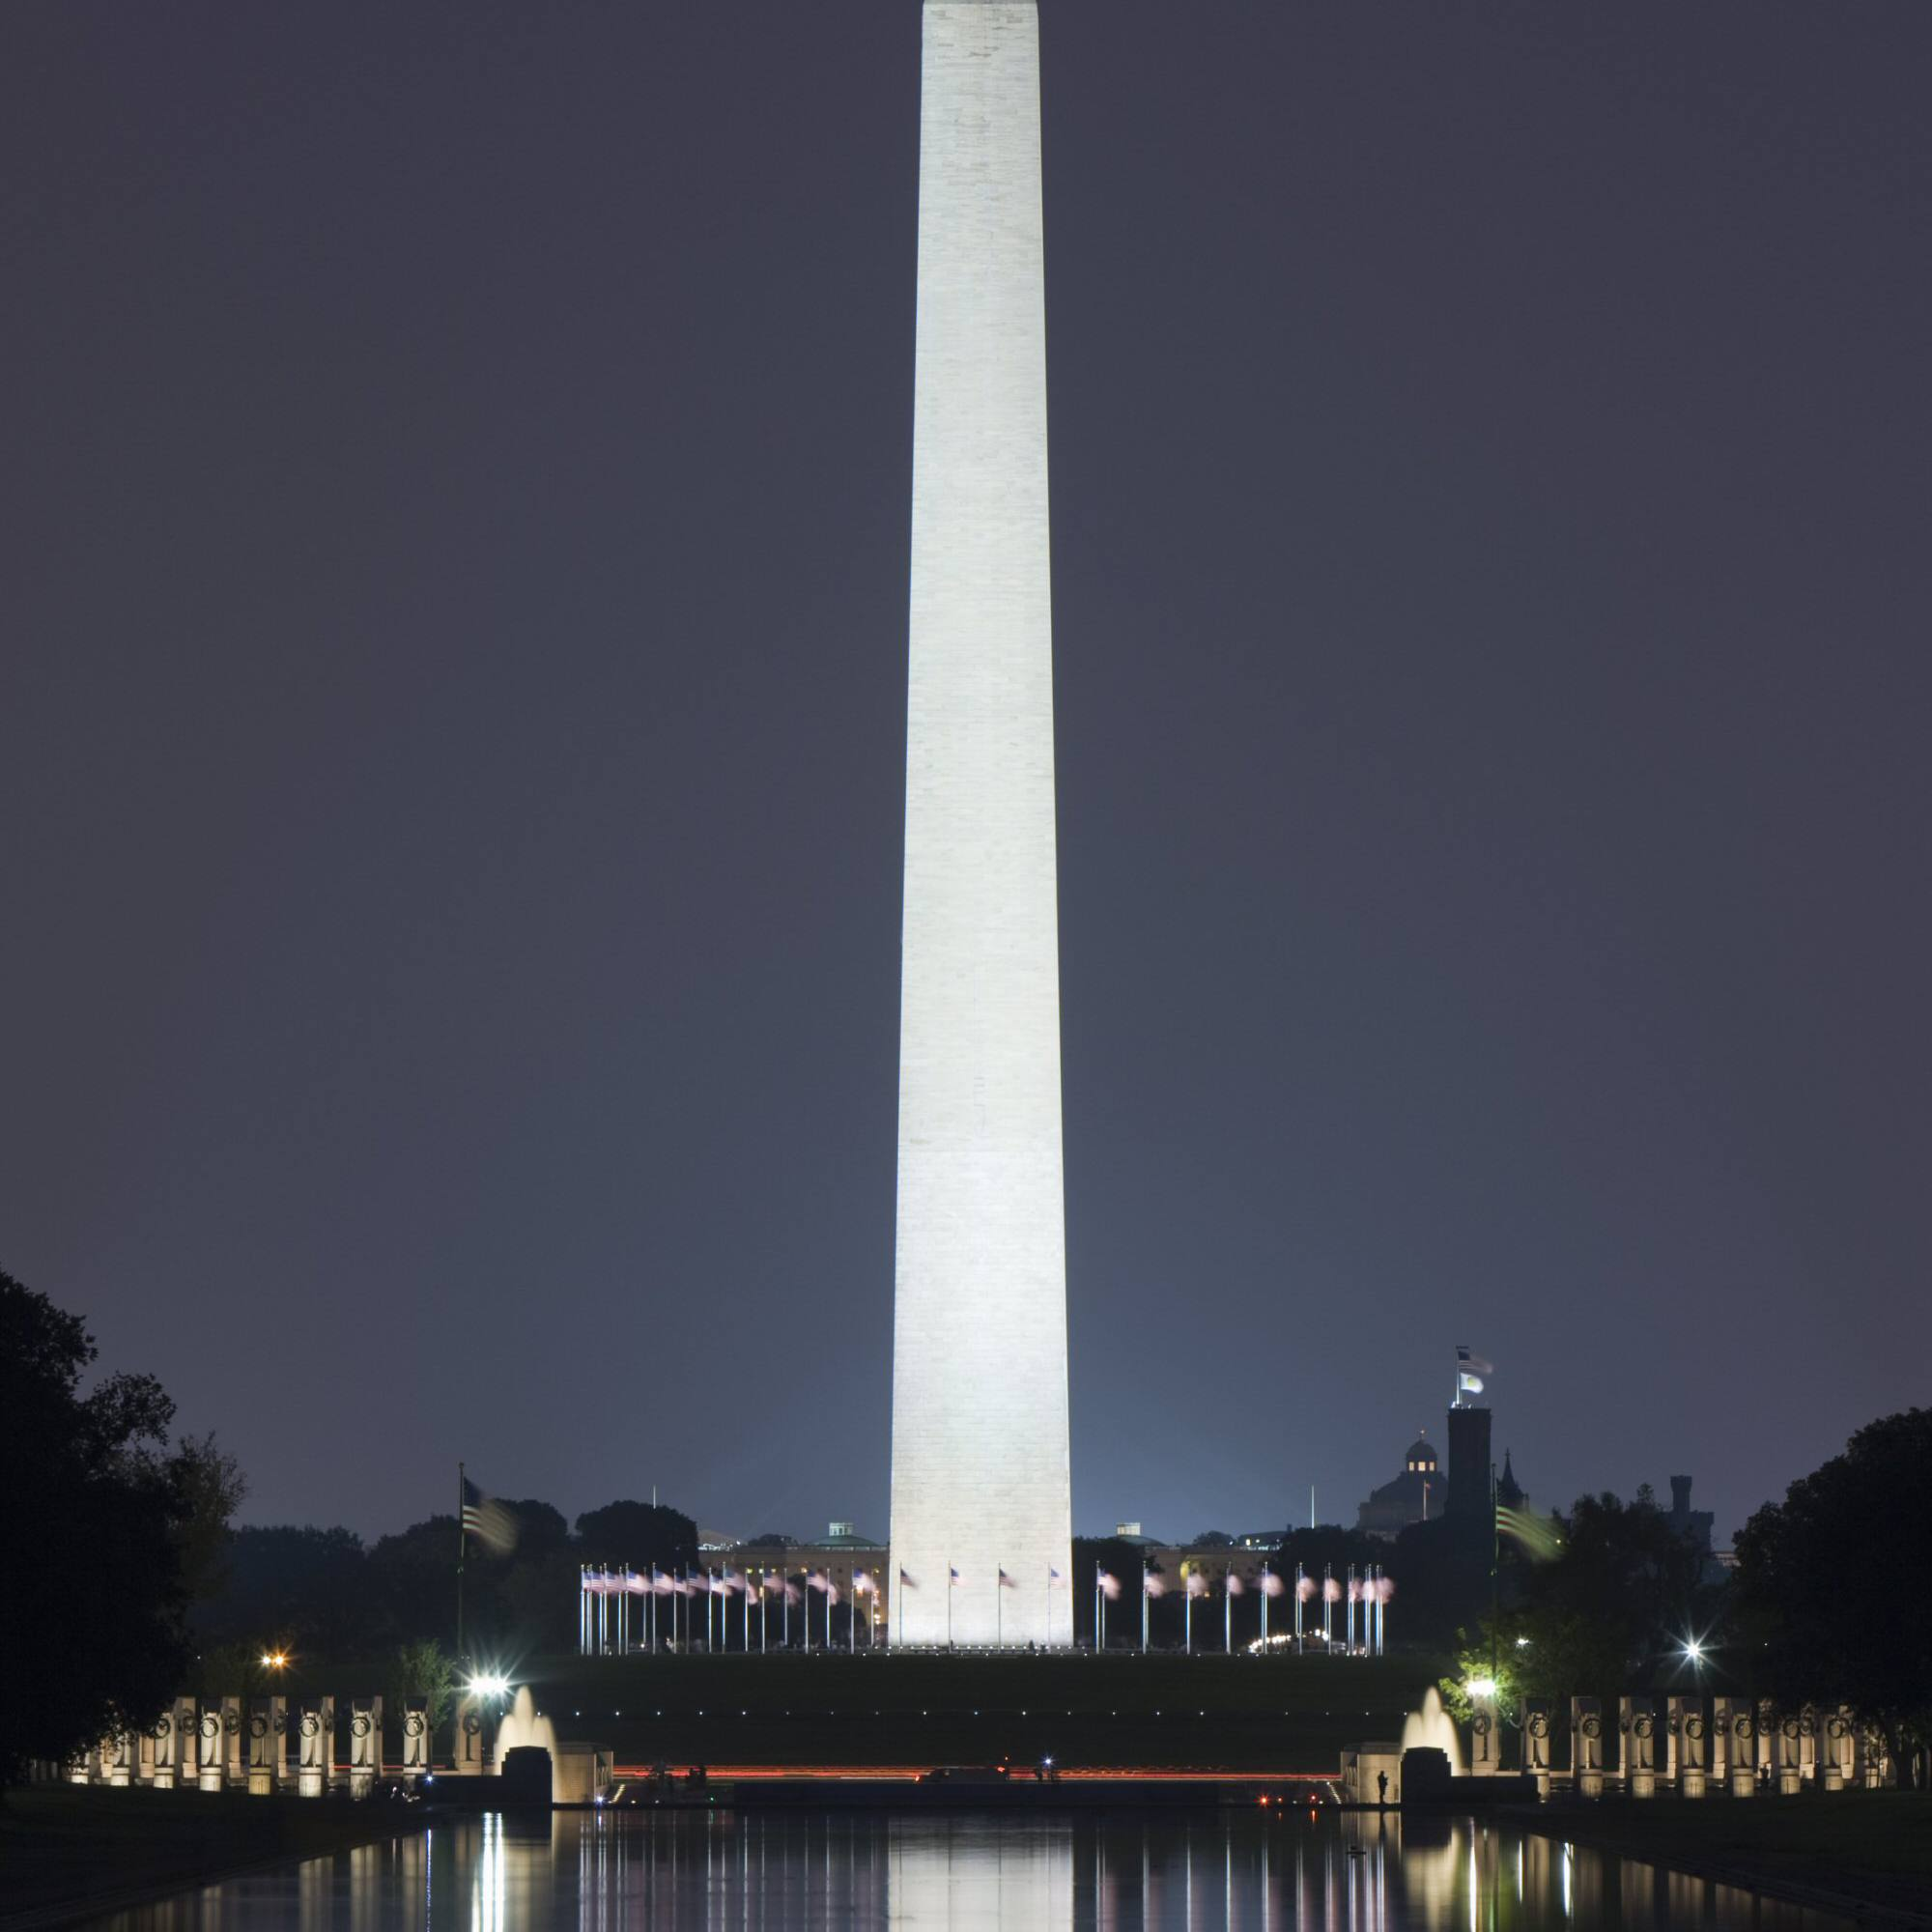 The Washington Monument illuminated at night, reflected in the Reflecting Pool